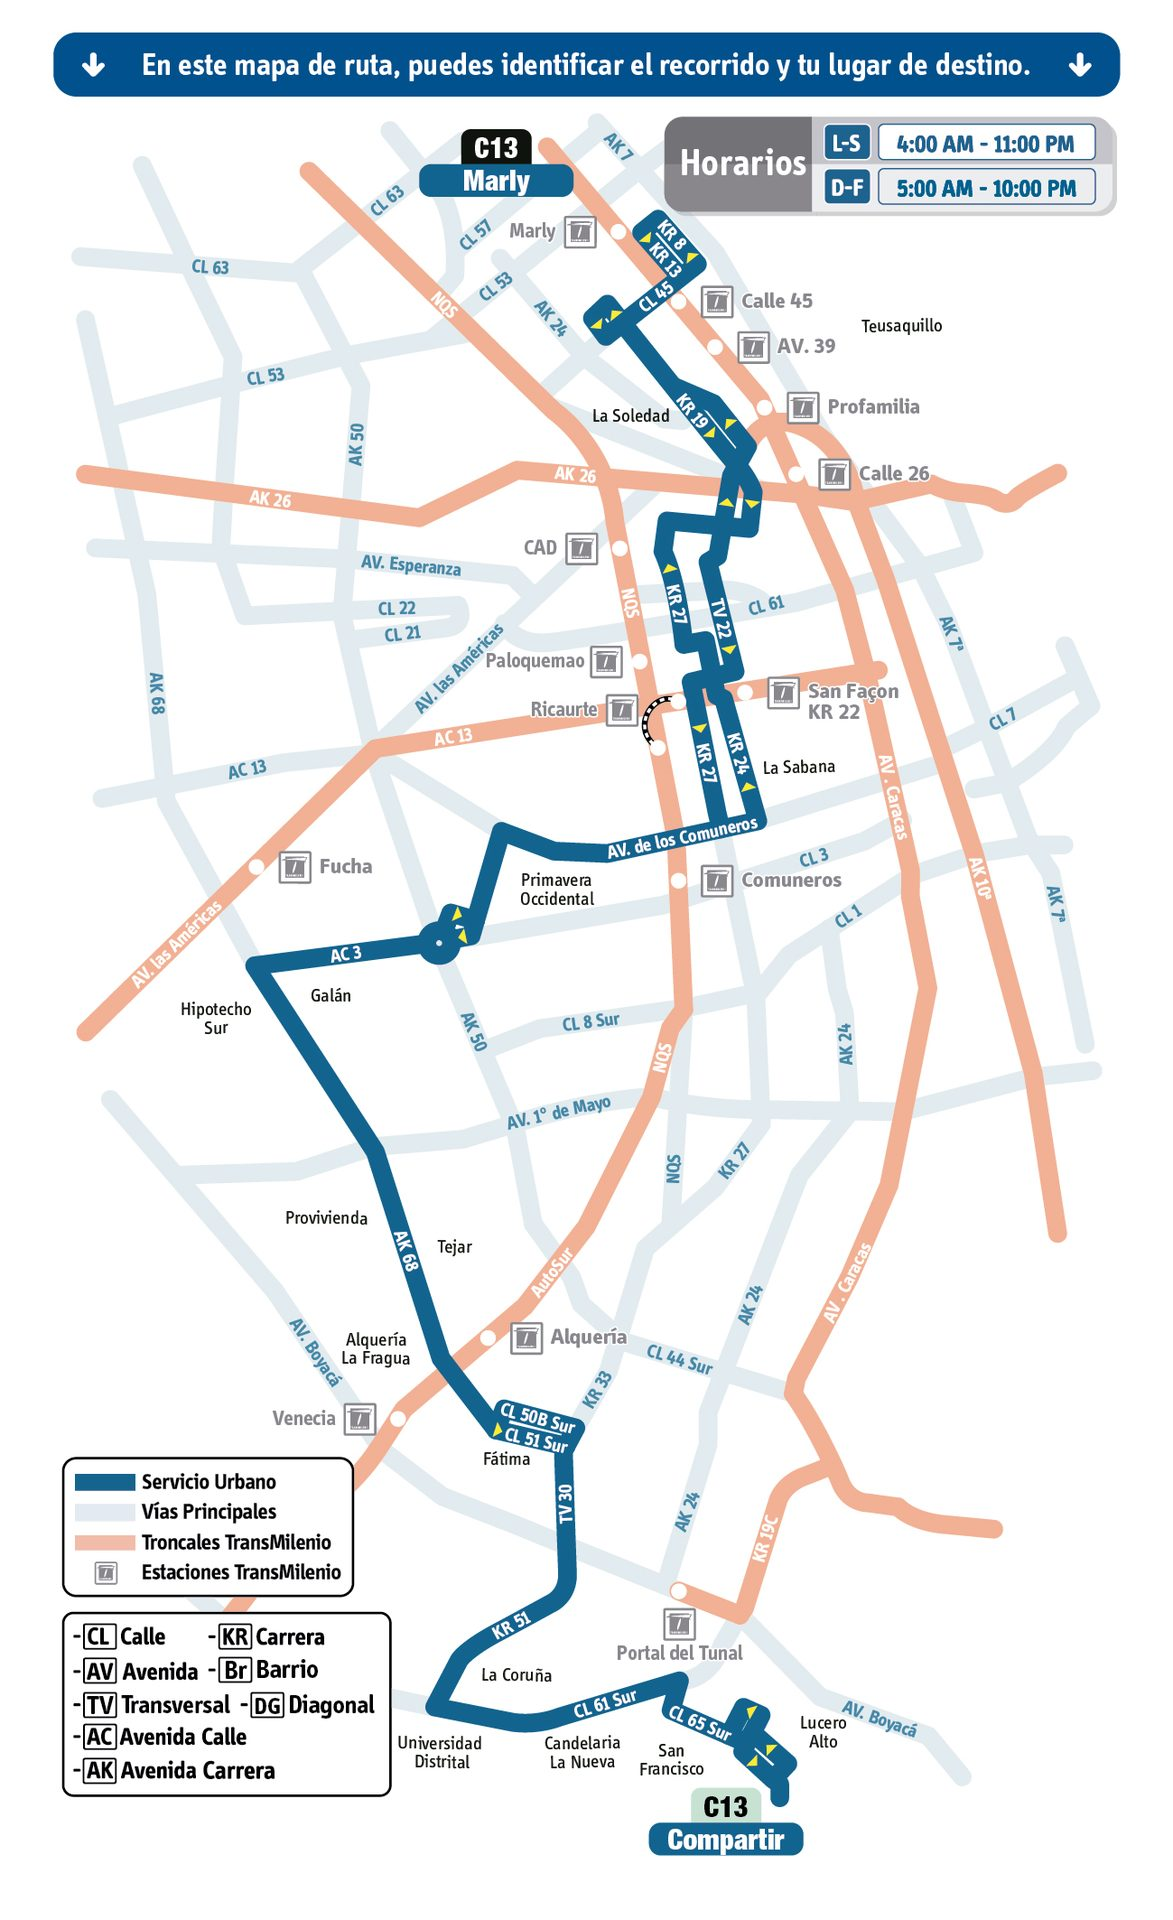 Ruta SITP: C13 Compartir ↔ Marly [Urbana] 2